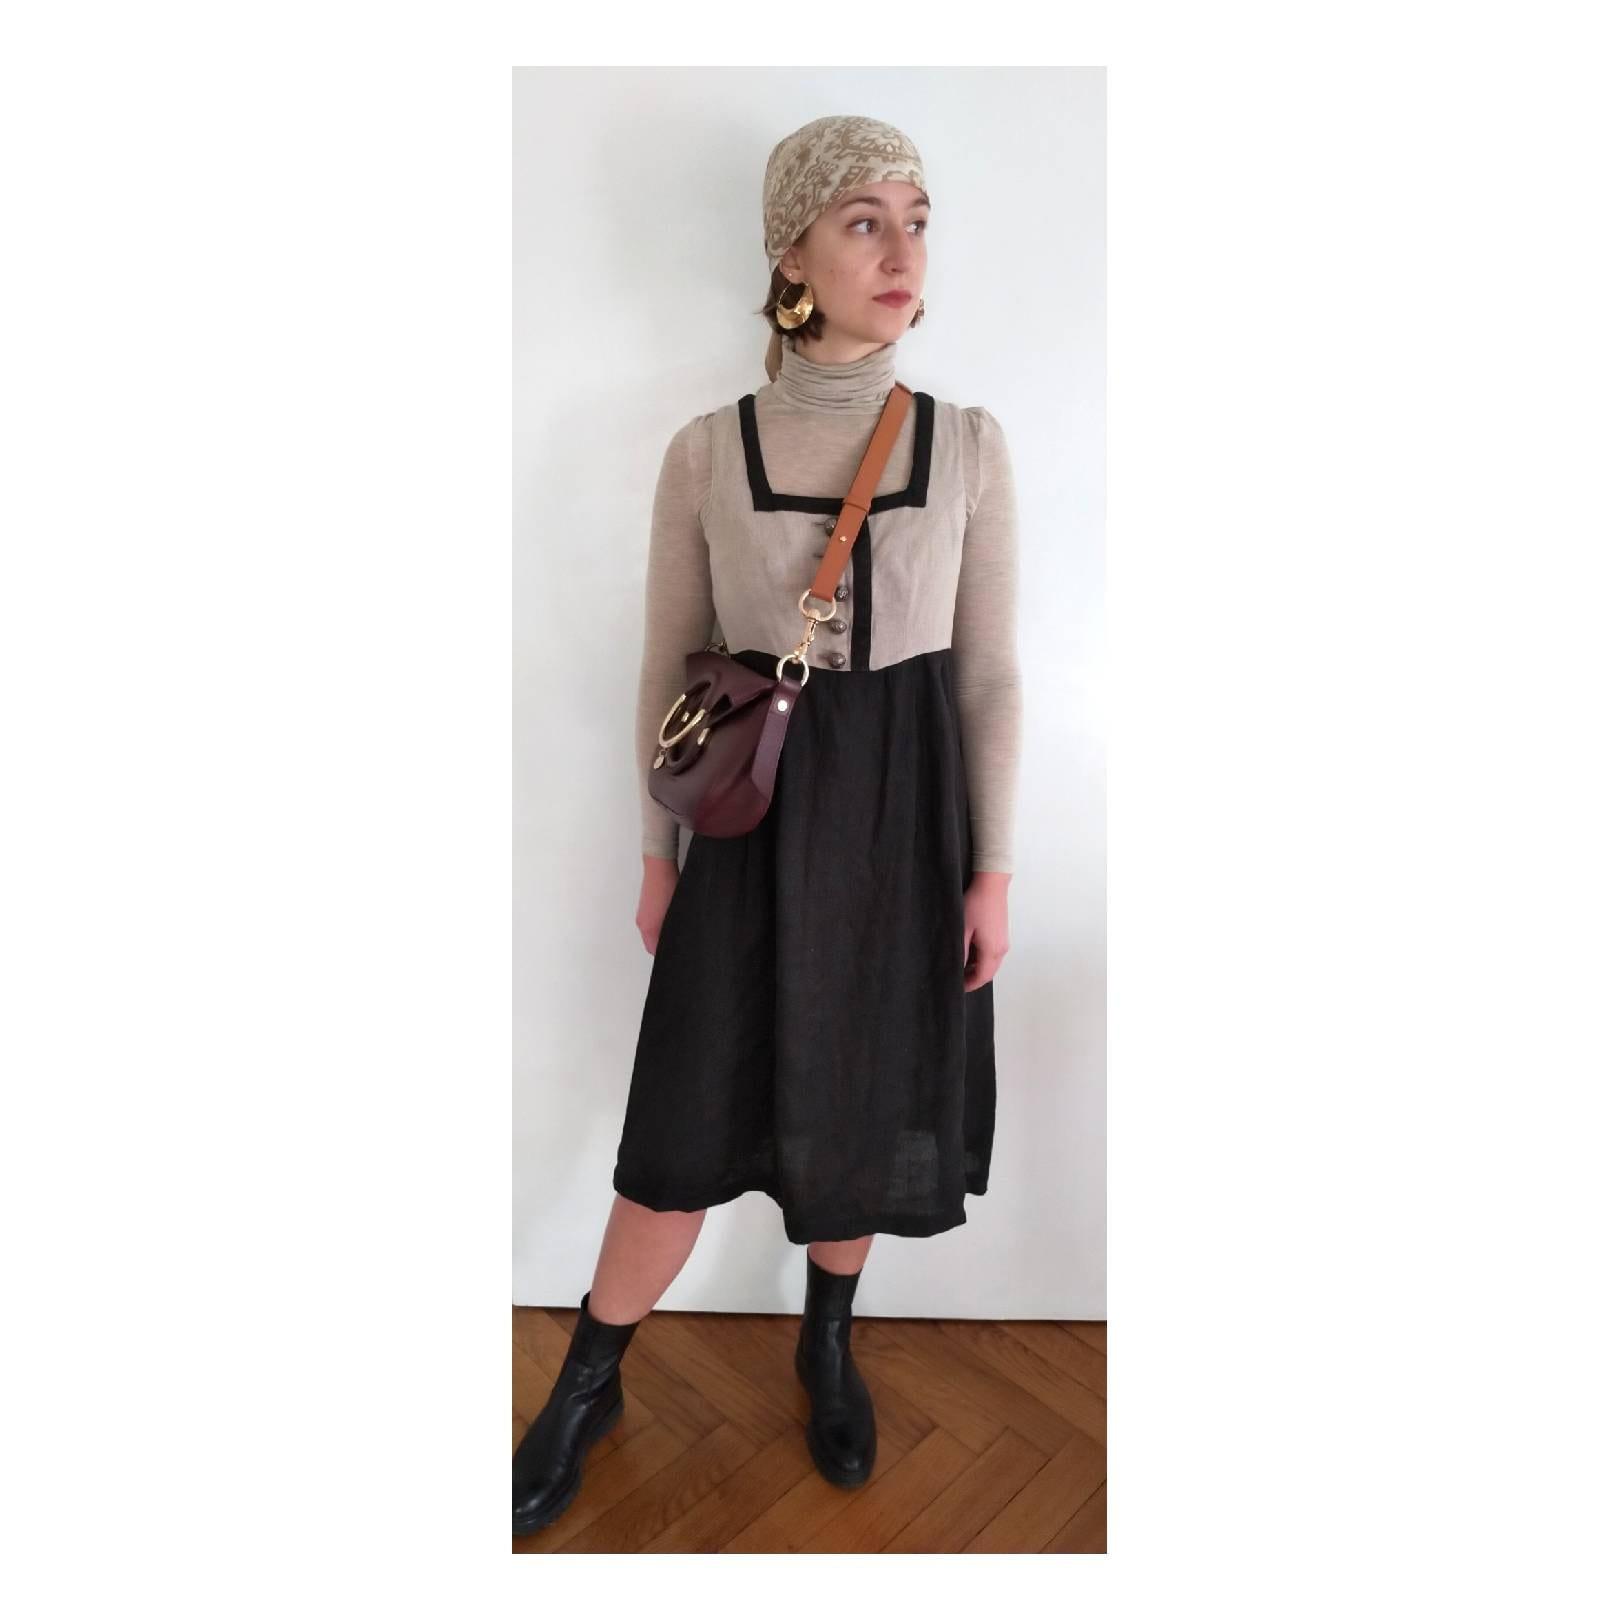 Vintage Aprons, Retro Aprons, Old Fashioned Aprons & Patterns Linen Dirndl, Linen Dress, Vintage Tracht Heavy Linen, Austrian Dress, Folk Linen, Beige Hippie Dress $113.75 AT vintagedancer.com